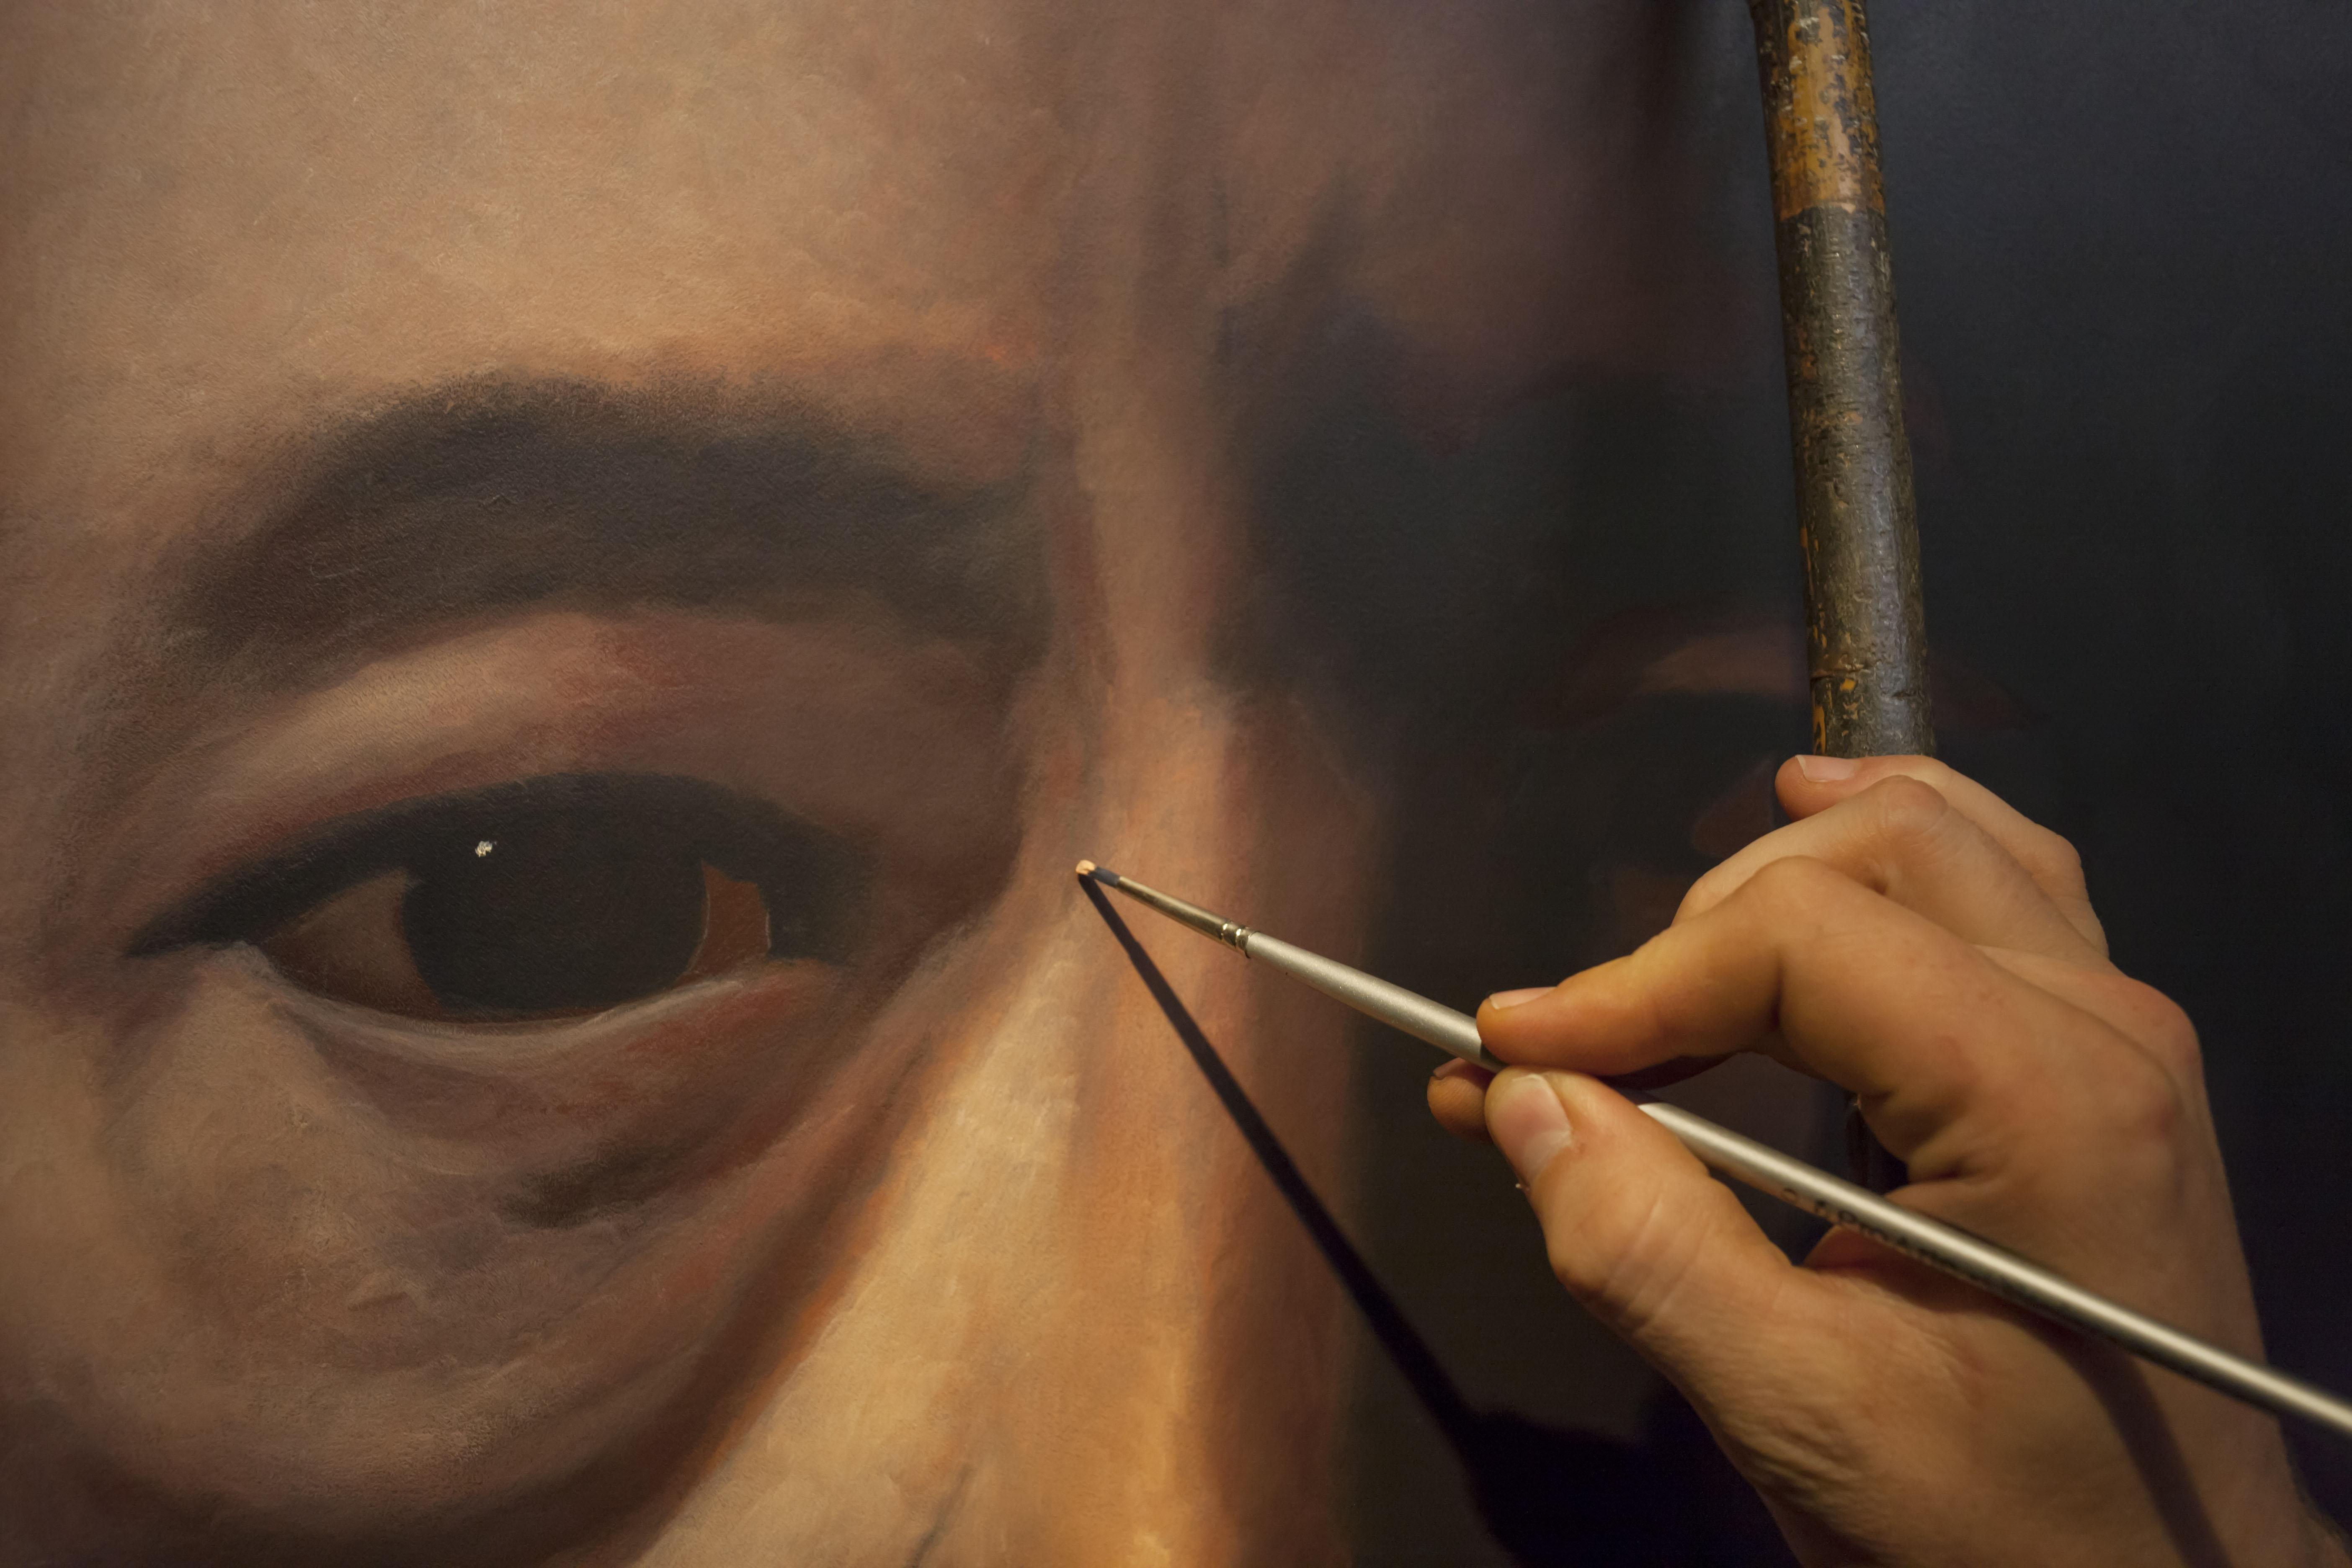 Matthew Penn, Artist Studio in Margate, Great Britain